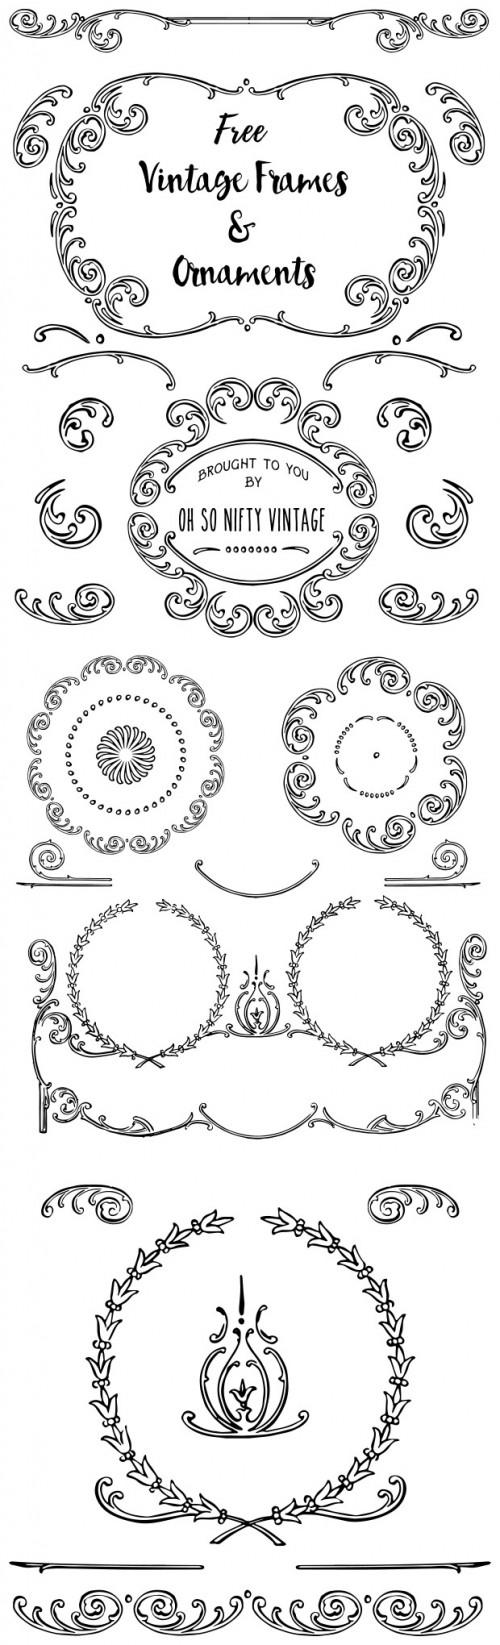 VGOSN-Free-Vintage-Frames-Ornaments-prev-2